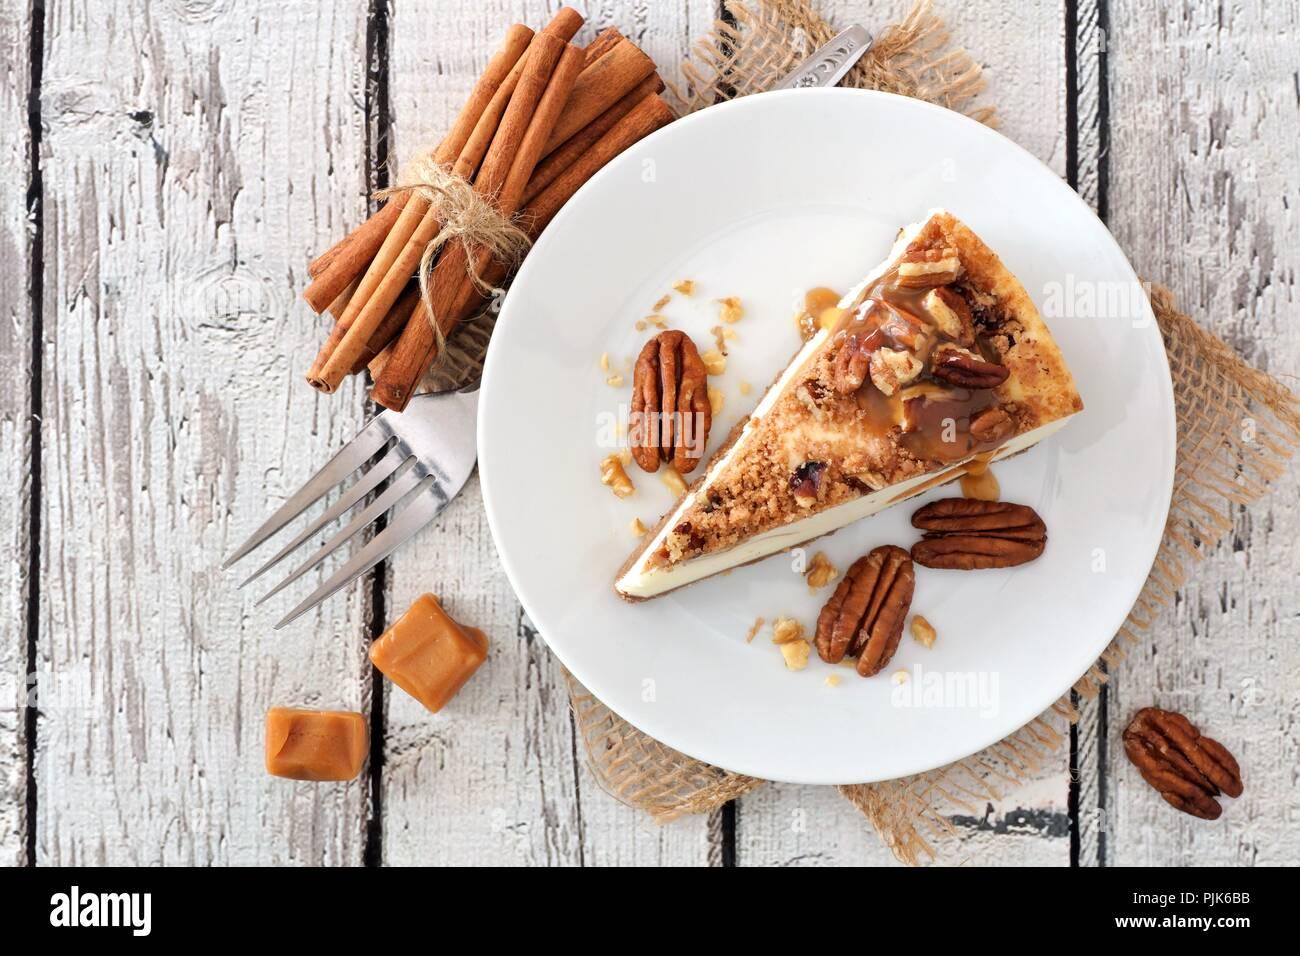 Rodaja de Pecan Caramel cheesecake, vista superior sobre un fondo de color blanco, de madera rústica Imagen De Stock